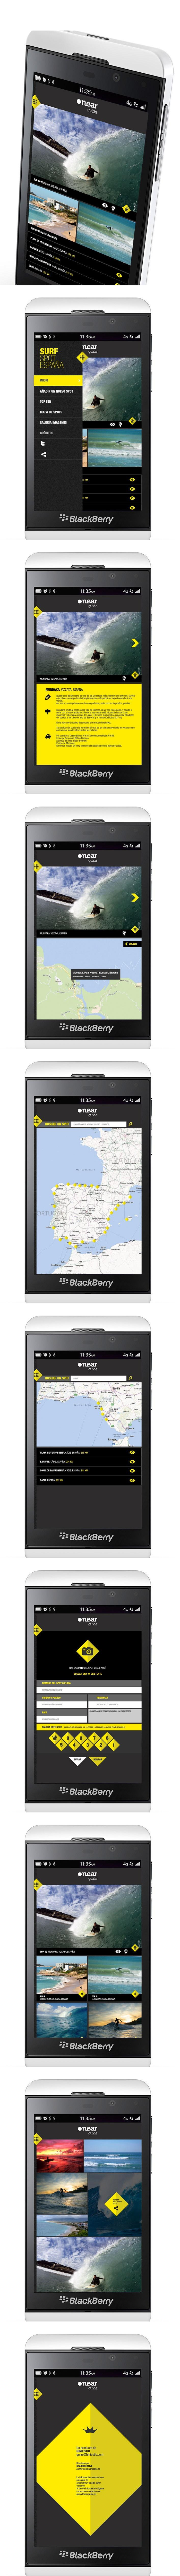 Blackberry Z10 Surf app by nearguide (http://www.nearguide.es/)